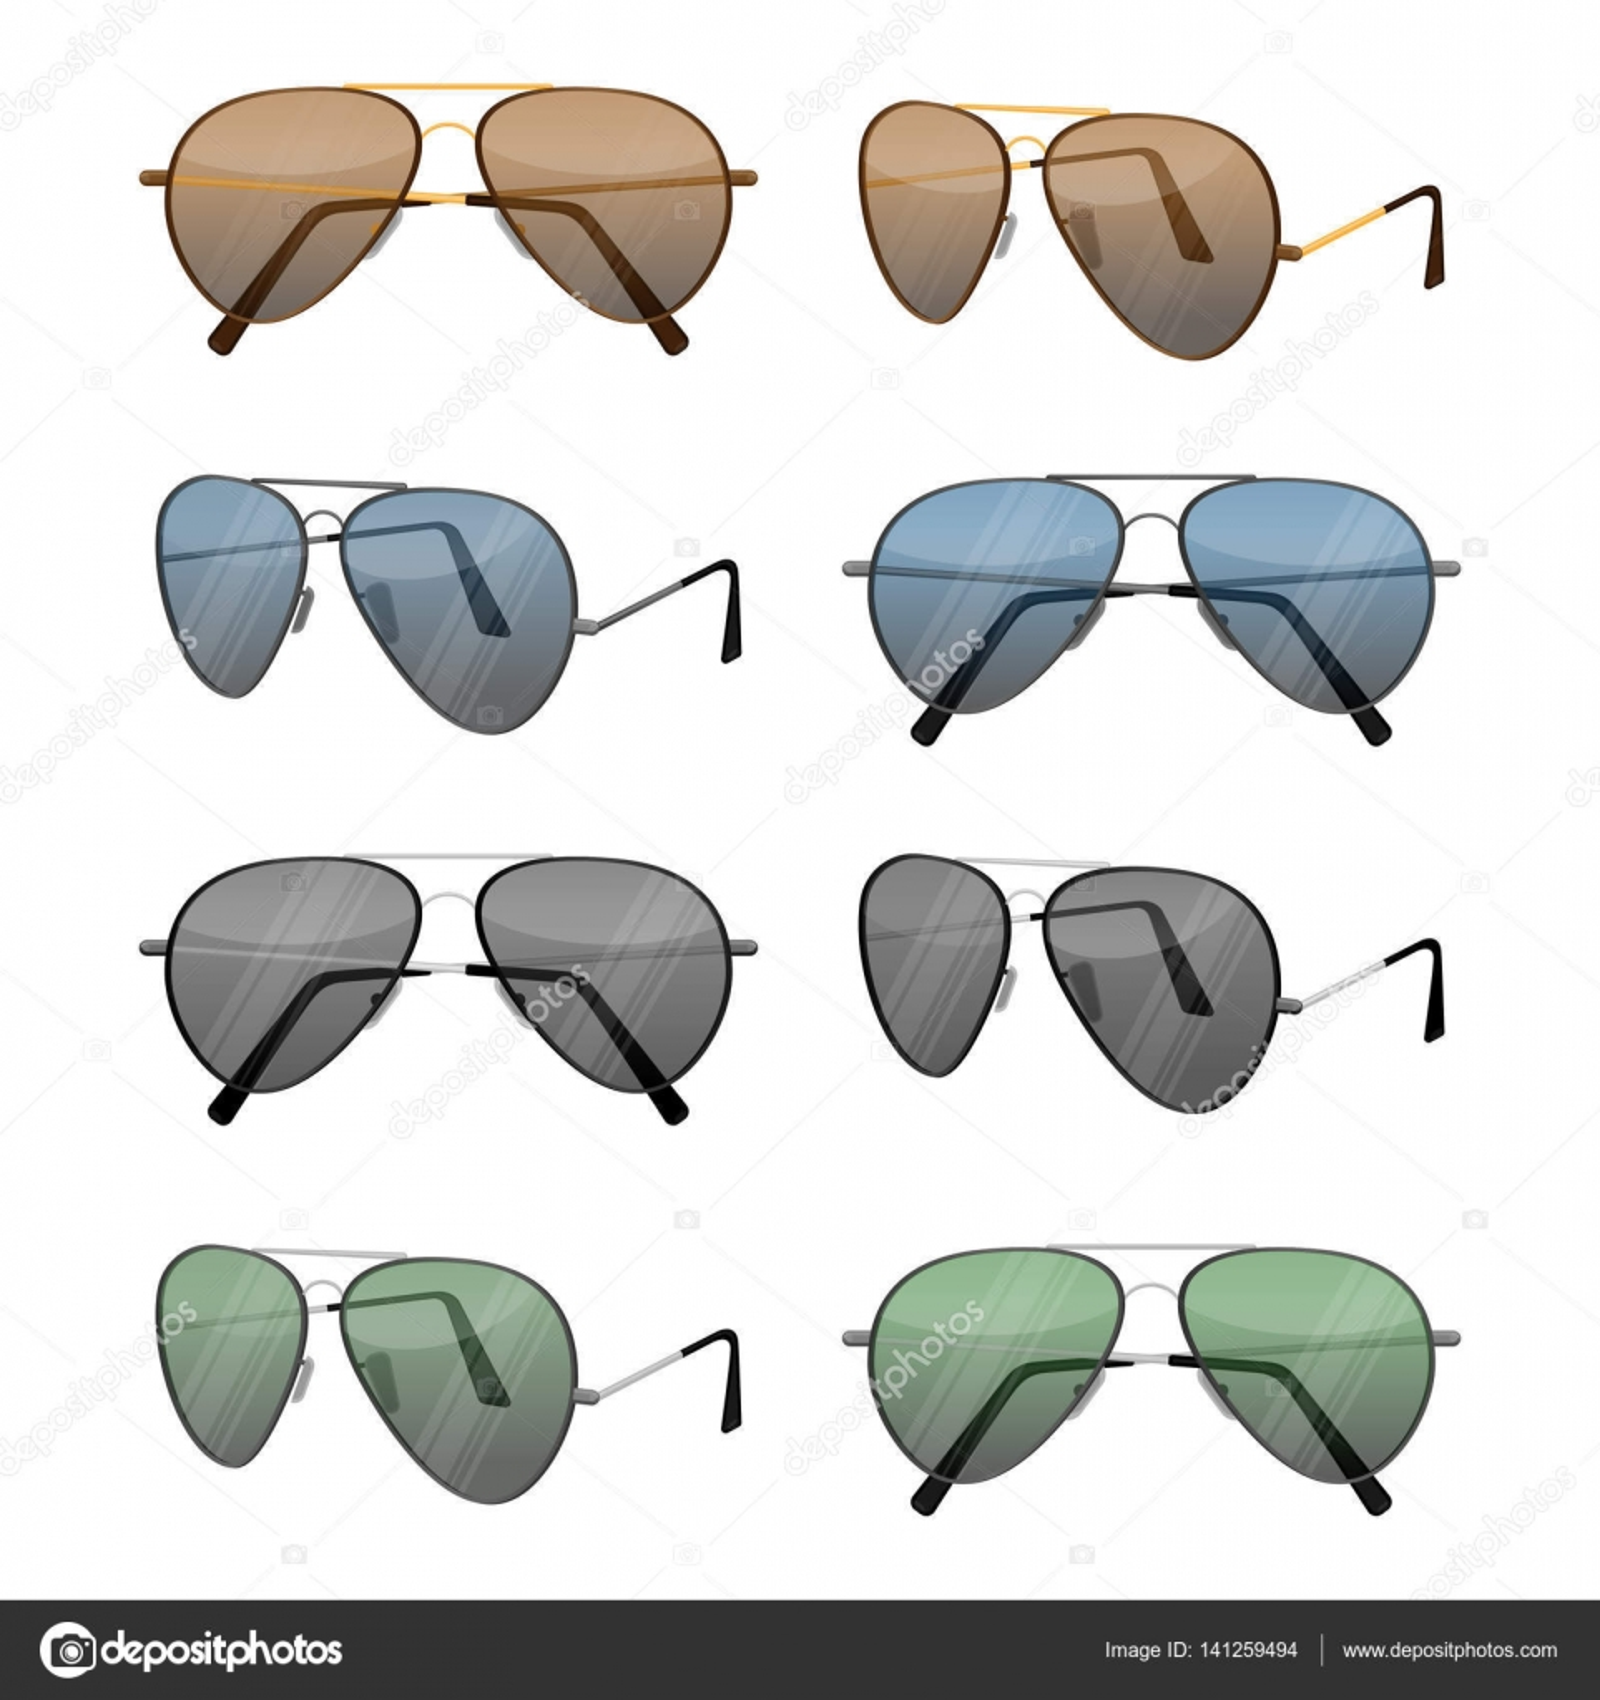 92c8fcaa2c Aviator γυαλιά ηλίου που απομονώνονται σε λευκό. Σκούρο καφέ αντανακλαστικό  φακό με πολύ λεπτό μεταλλικό σκελετό με διπλή γέφυρα και ξιφολόγχη  ακουστικά ή ...